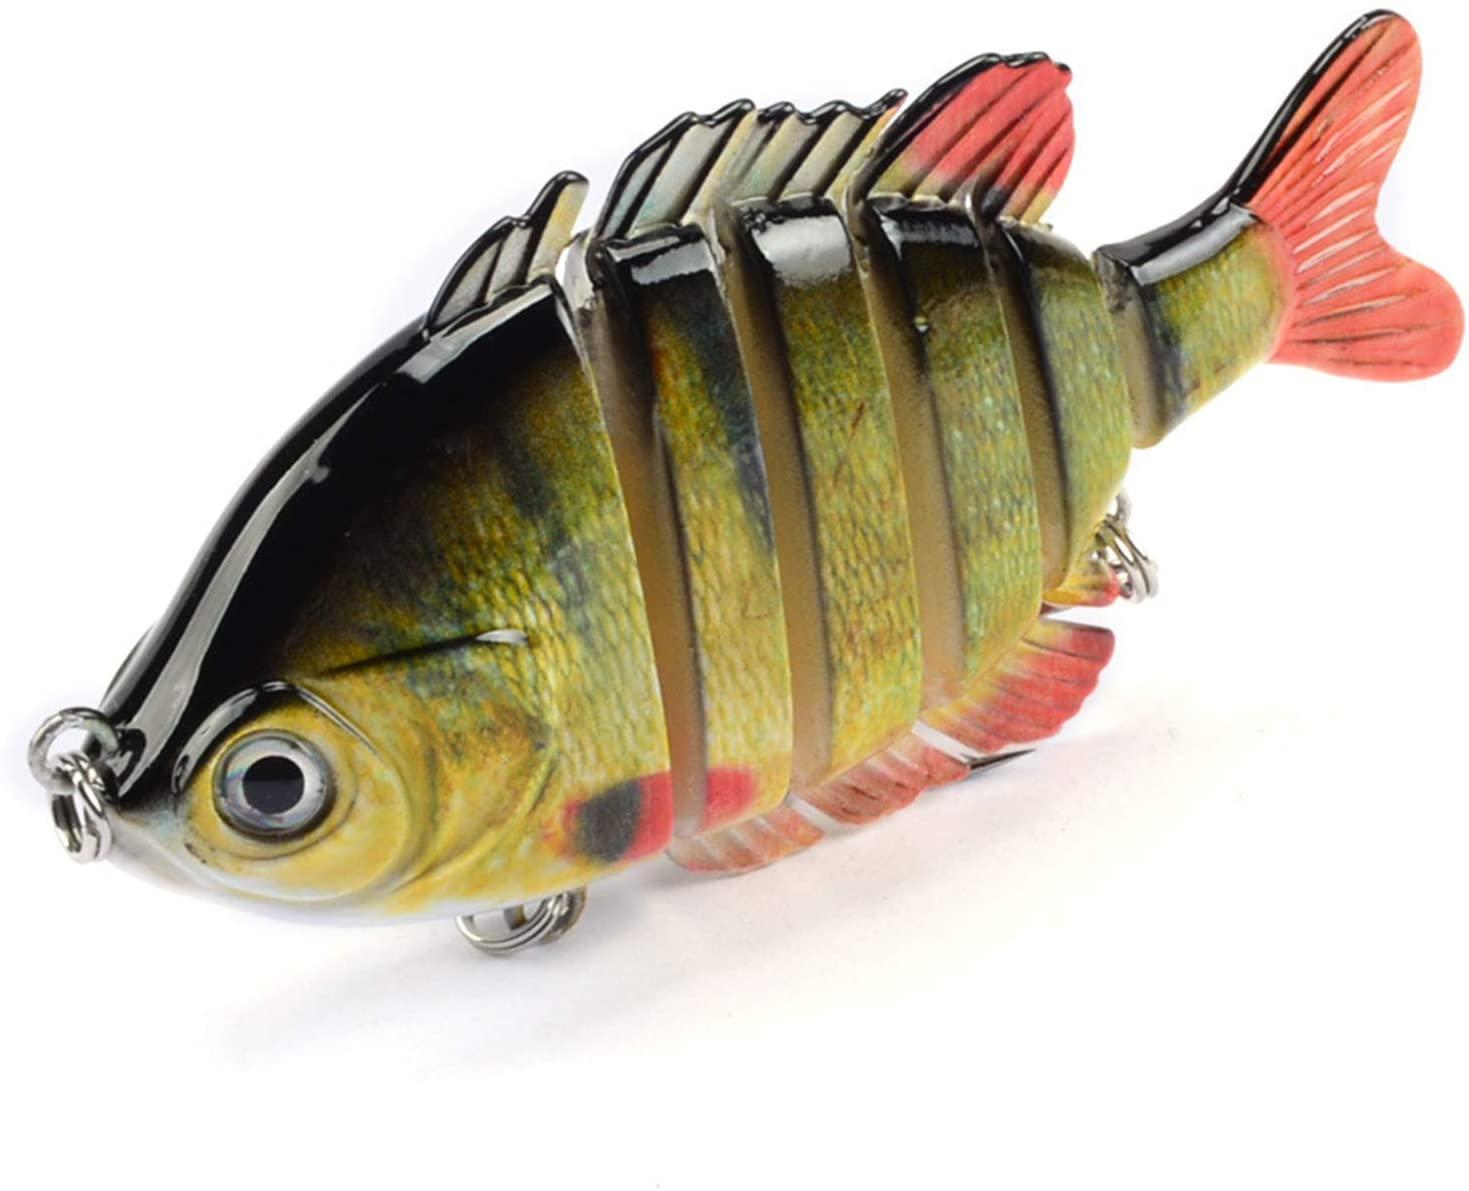 Fishing Lures Lifelike Bass Lures Swimfish Multi Jointed Panfish Bluegill Swimbaits Hard Topwater Bass Lures Fishing Lure Crank Saltwater 3.5in/0.9oz